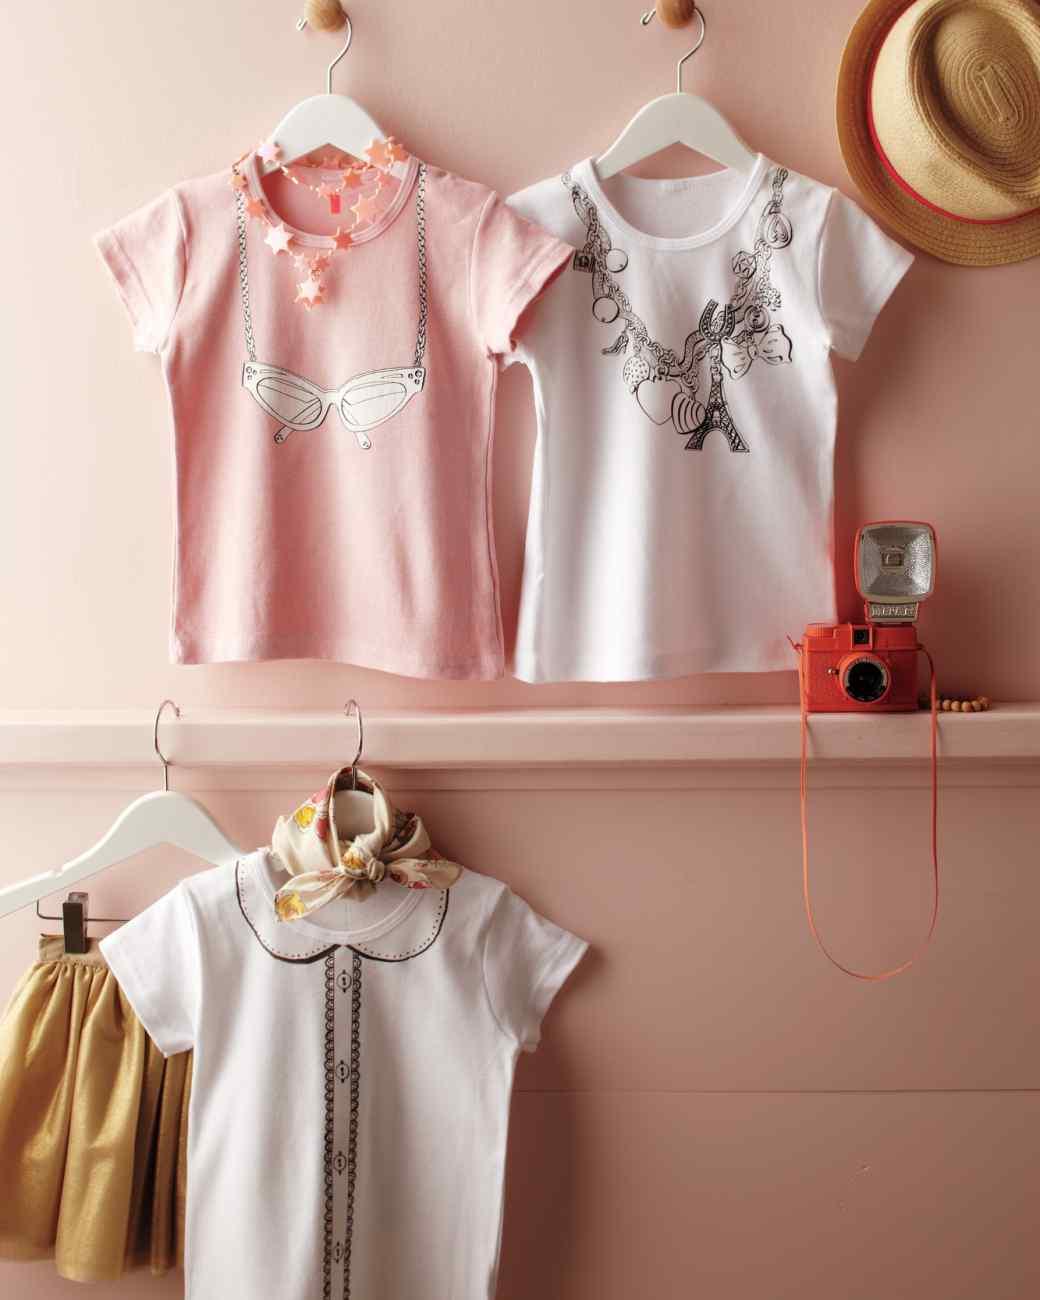 Shirt clipart dress up L'oeil children's glasses Trompe adults'!)